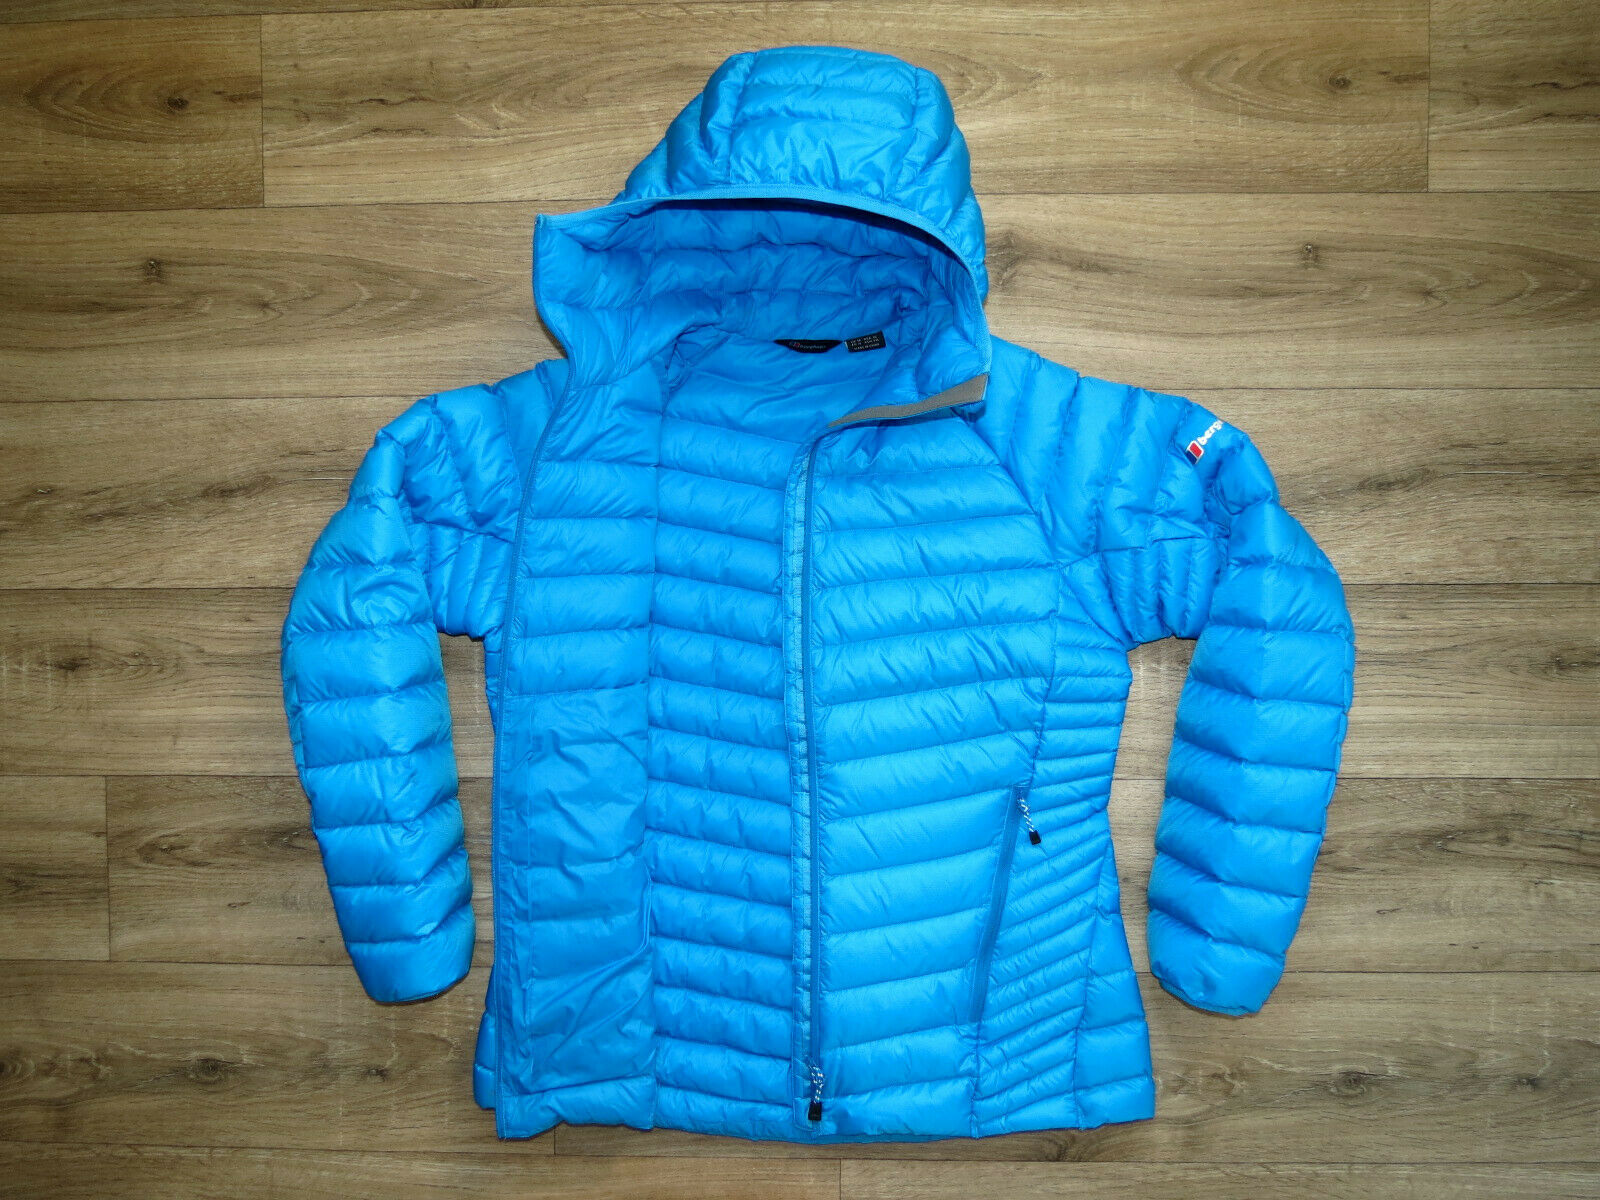 Berghaus Horno 700 Hydrodown Wohombres Insulated Jacket XL16   Abrigo